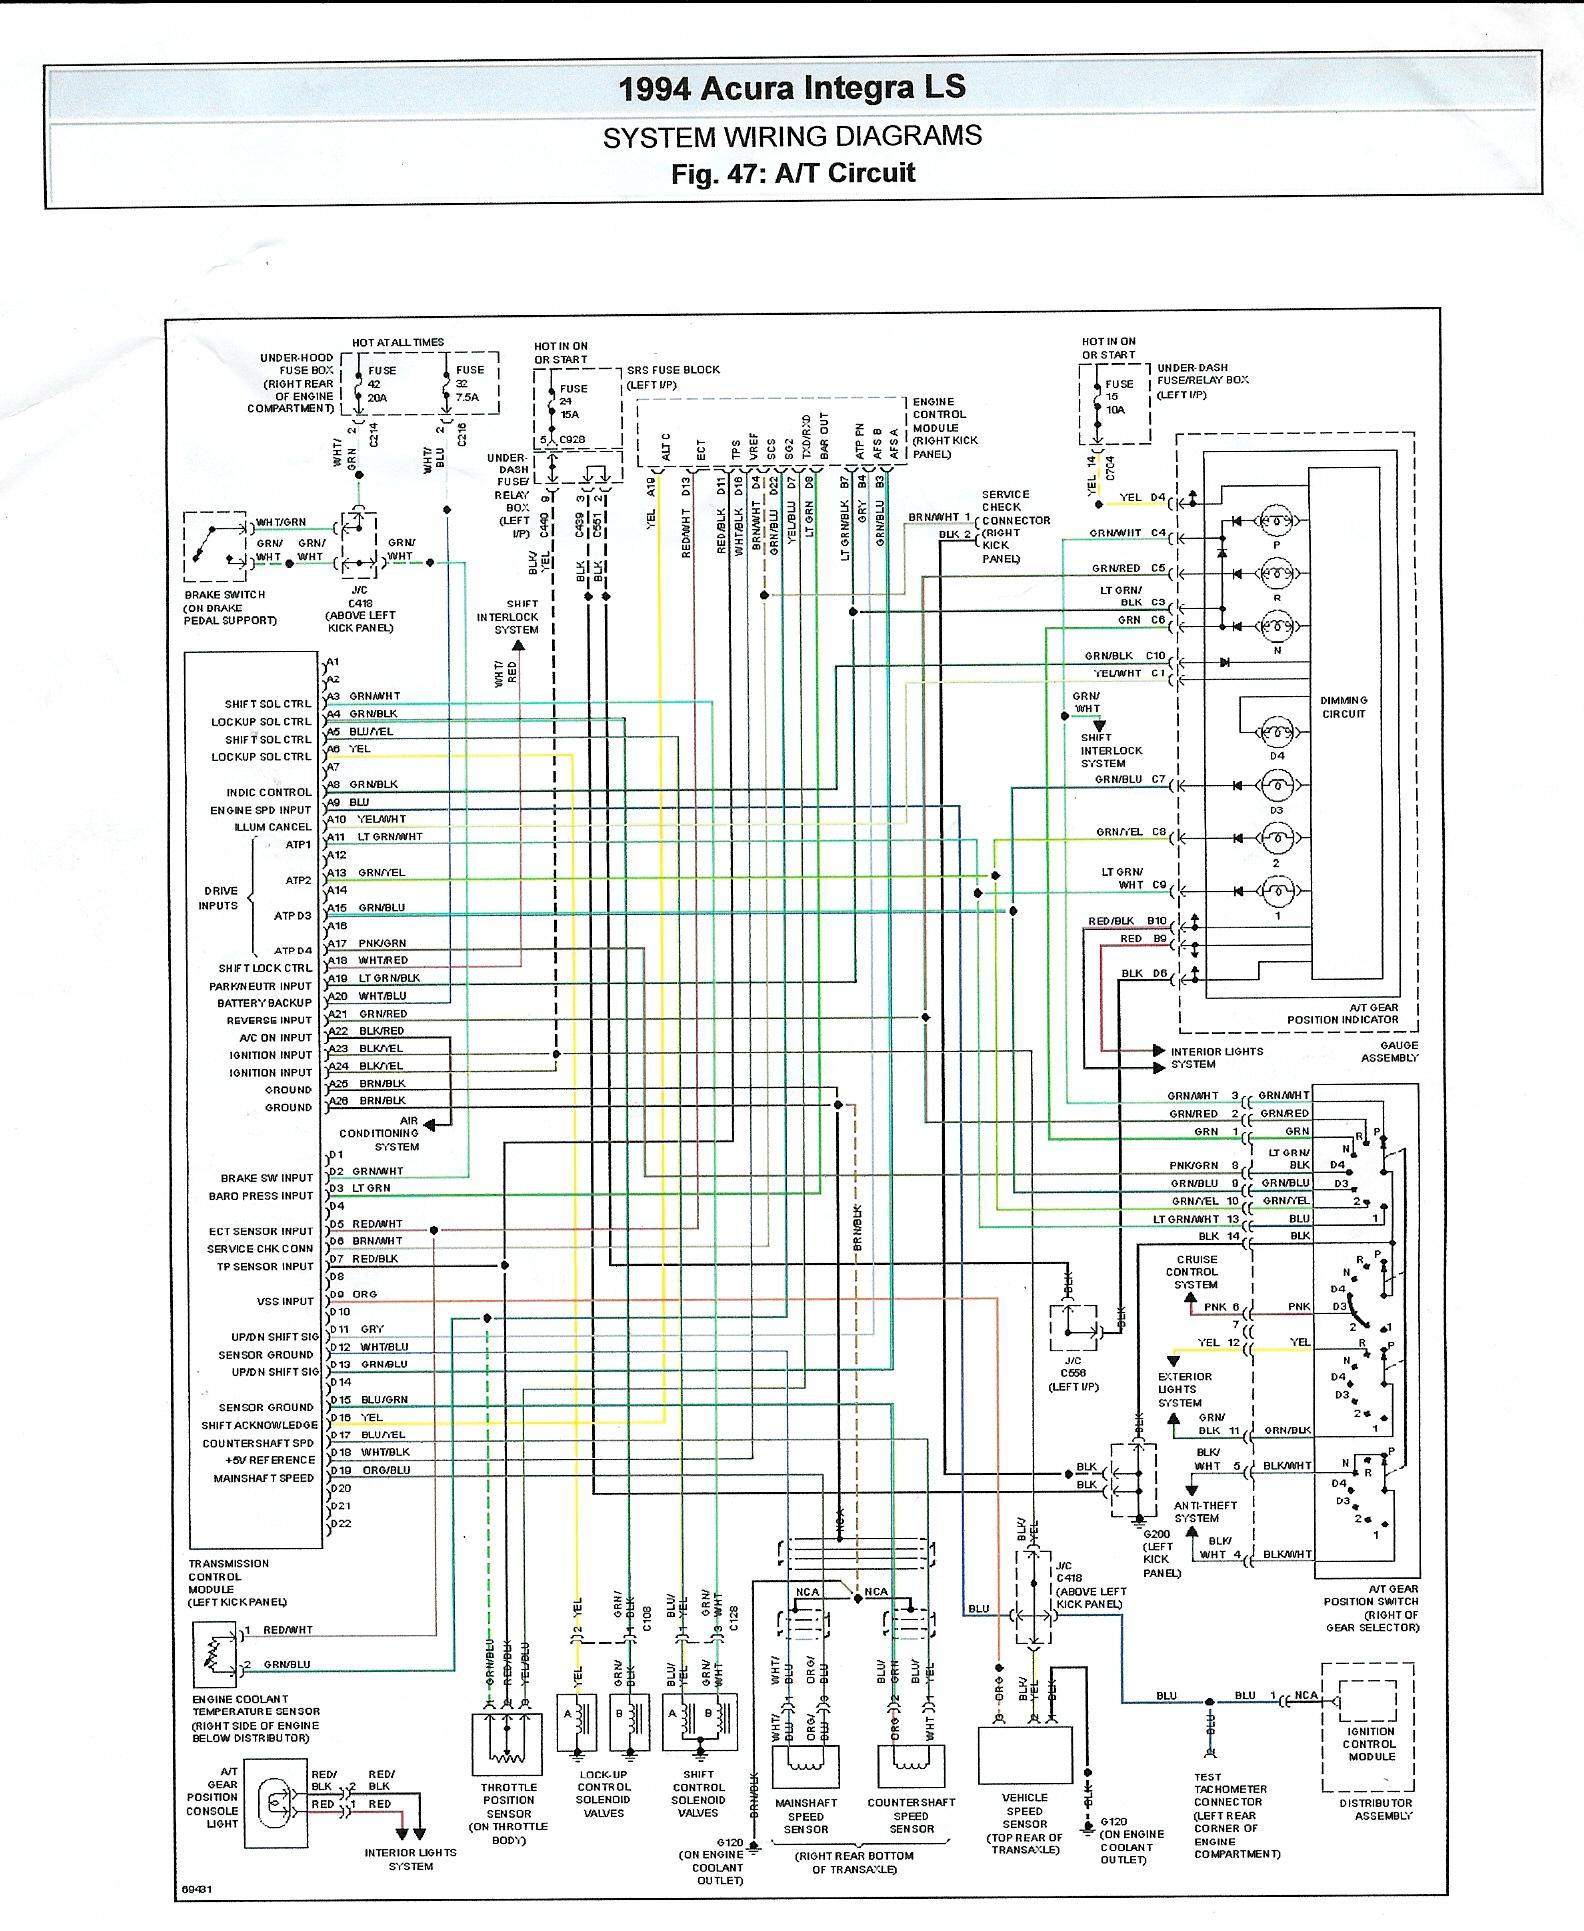 Cool Honda Civic Wiring Diagram For 89 Wiring Diagram Tutorial Wiring Cloud Ittabisraaidewilluminateatxorg